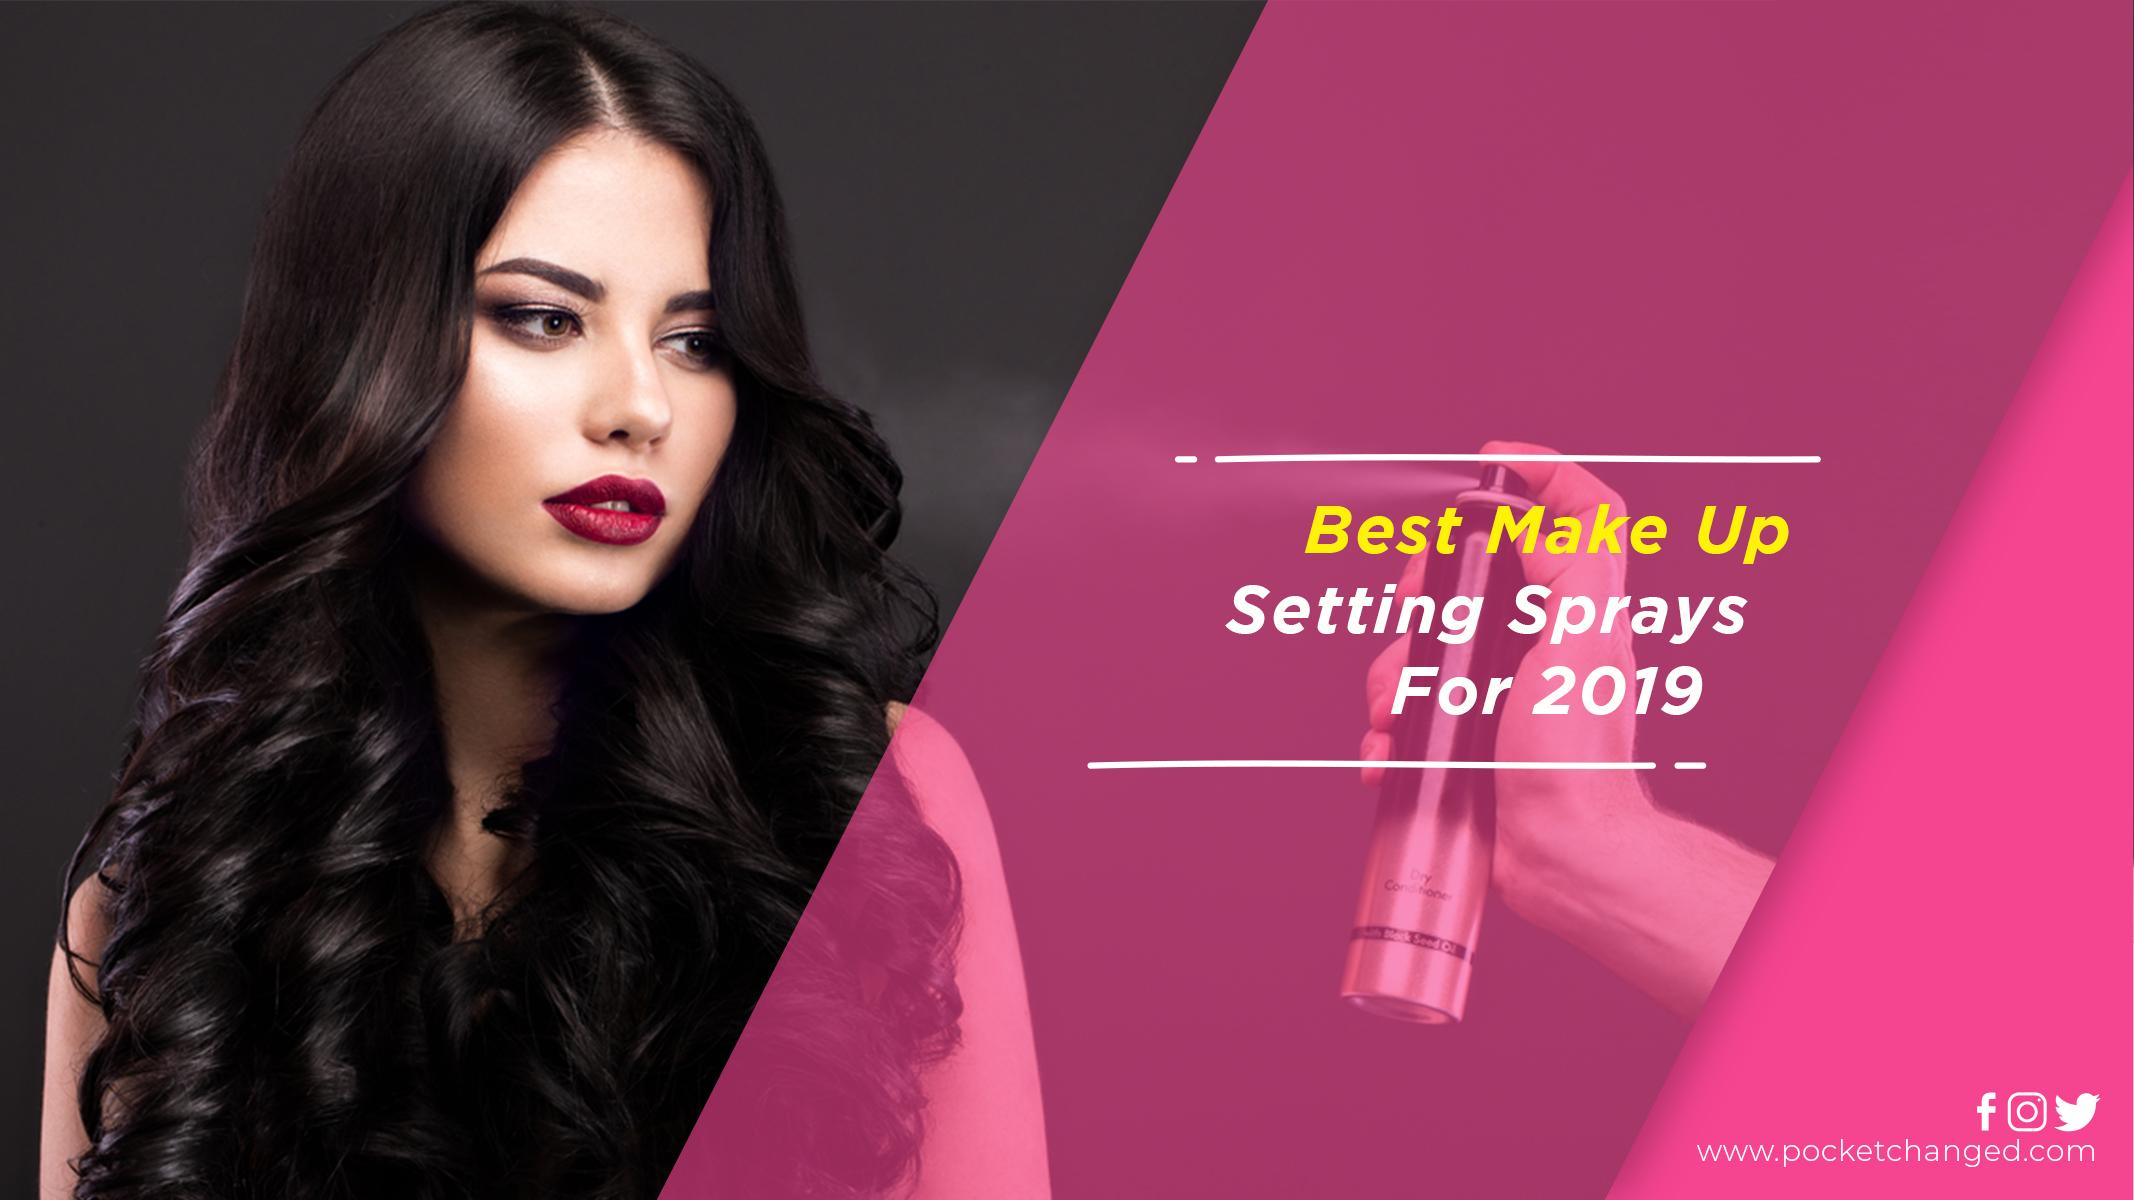 Best-Make-Up-Setting-Sprays-For-2019